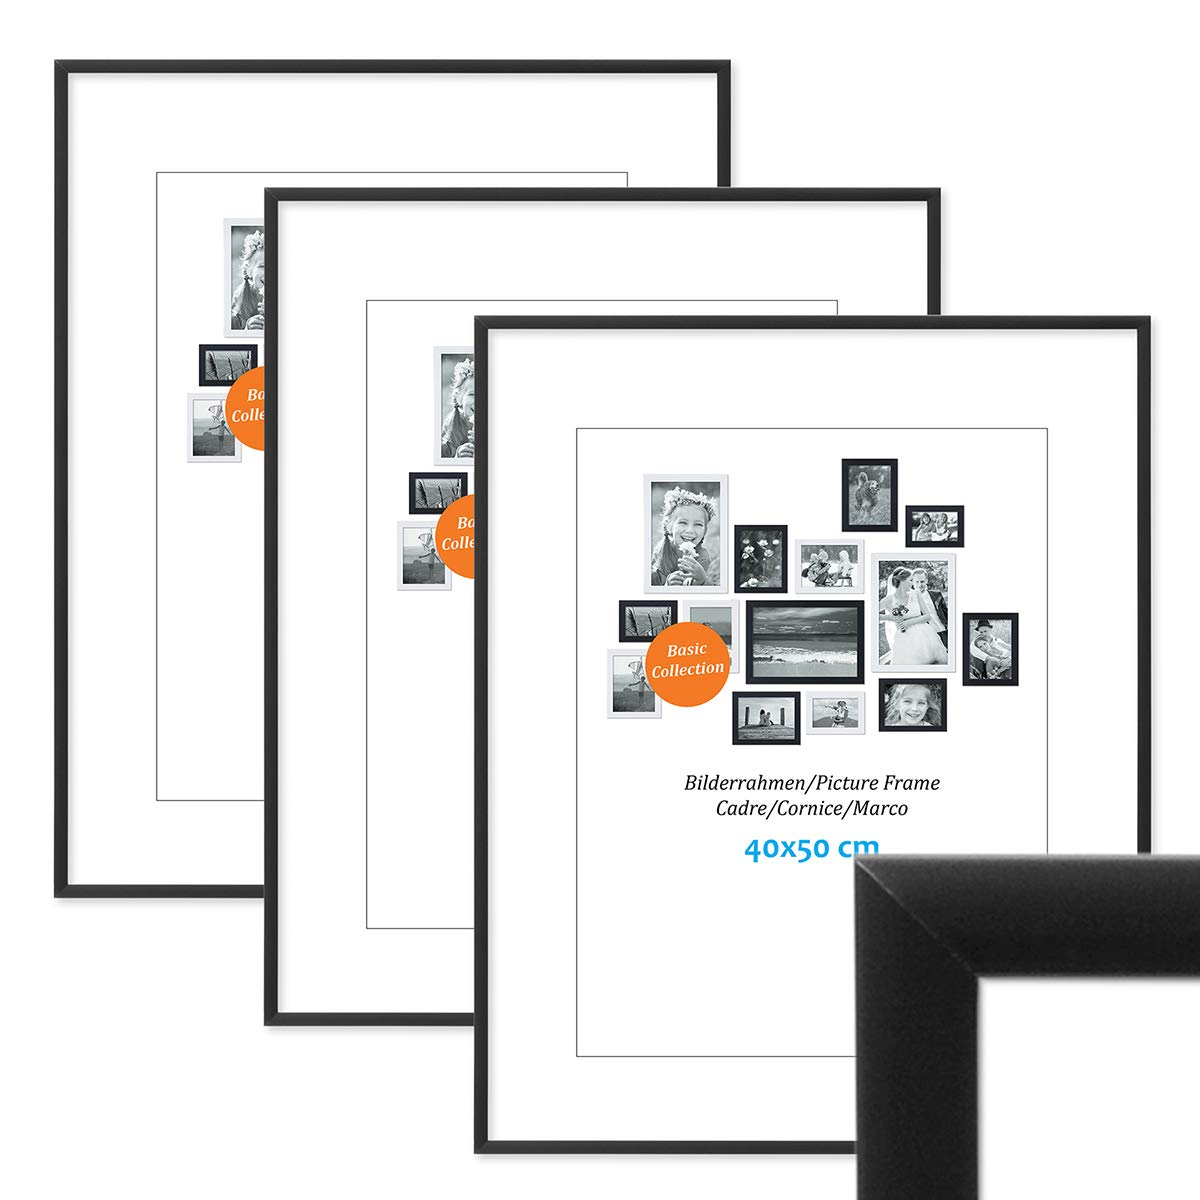 PHOTOLINI 7er Set Alu-Bilderrahmen 10x15 bis 21x30 cm Modern Gold Aluminium-Rahmen mit Acrylglas//Bildergalerie//Foto-Collage